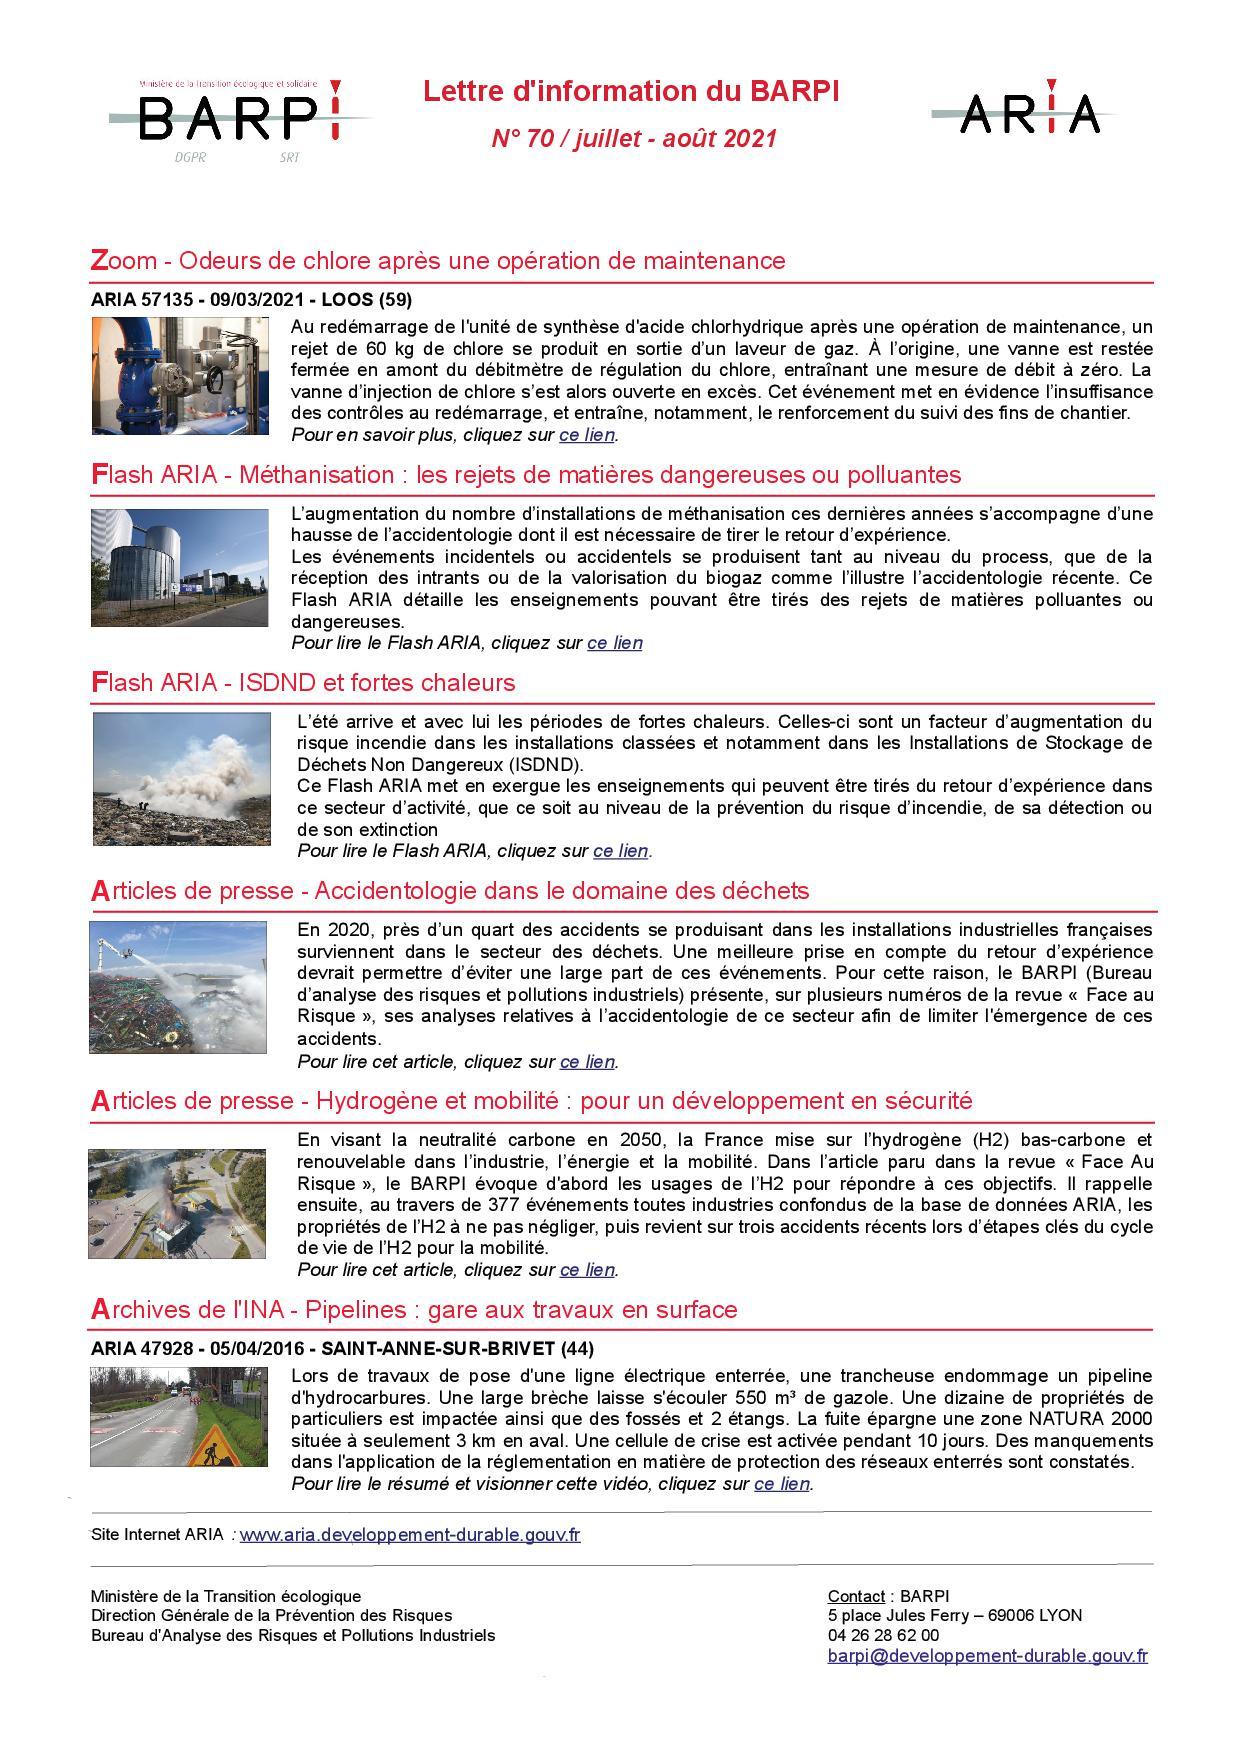 Lettre D'information N° 70 / Juillet – Août 2021